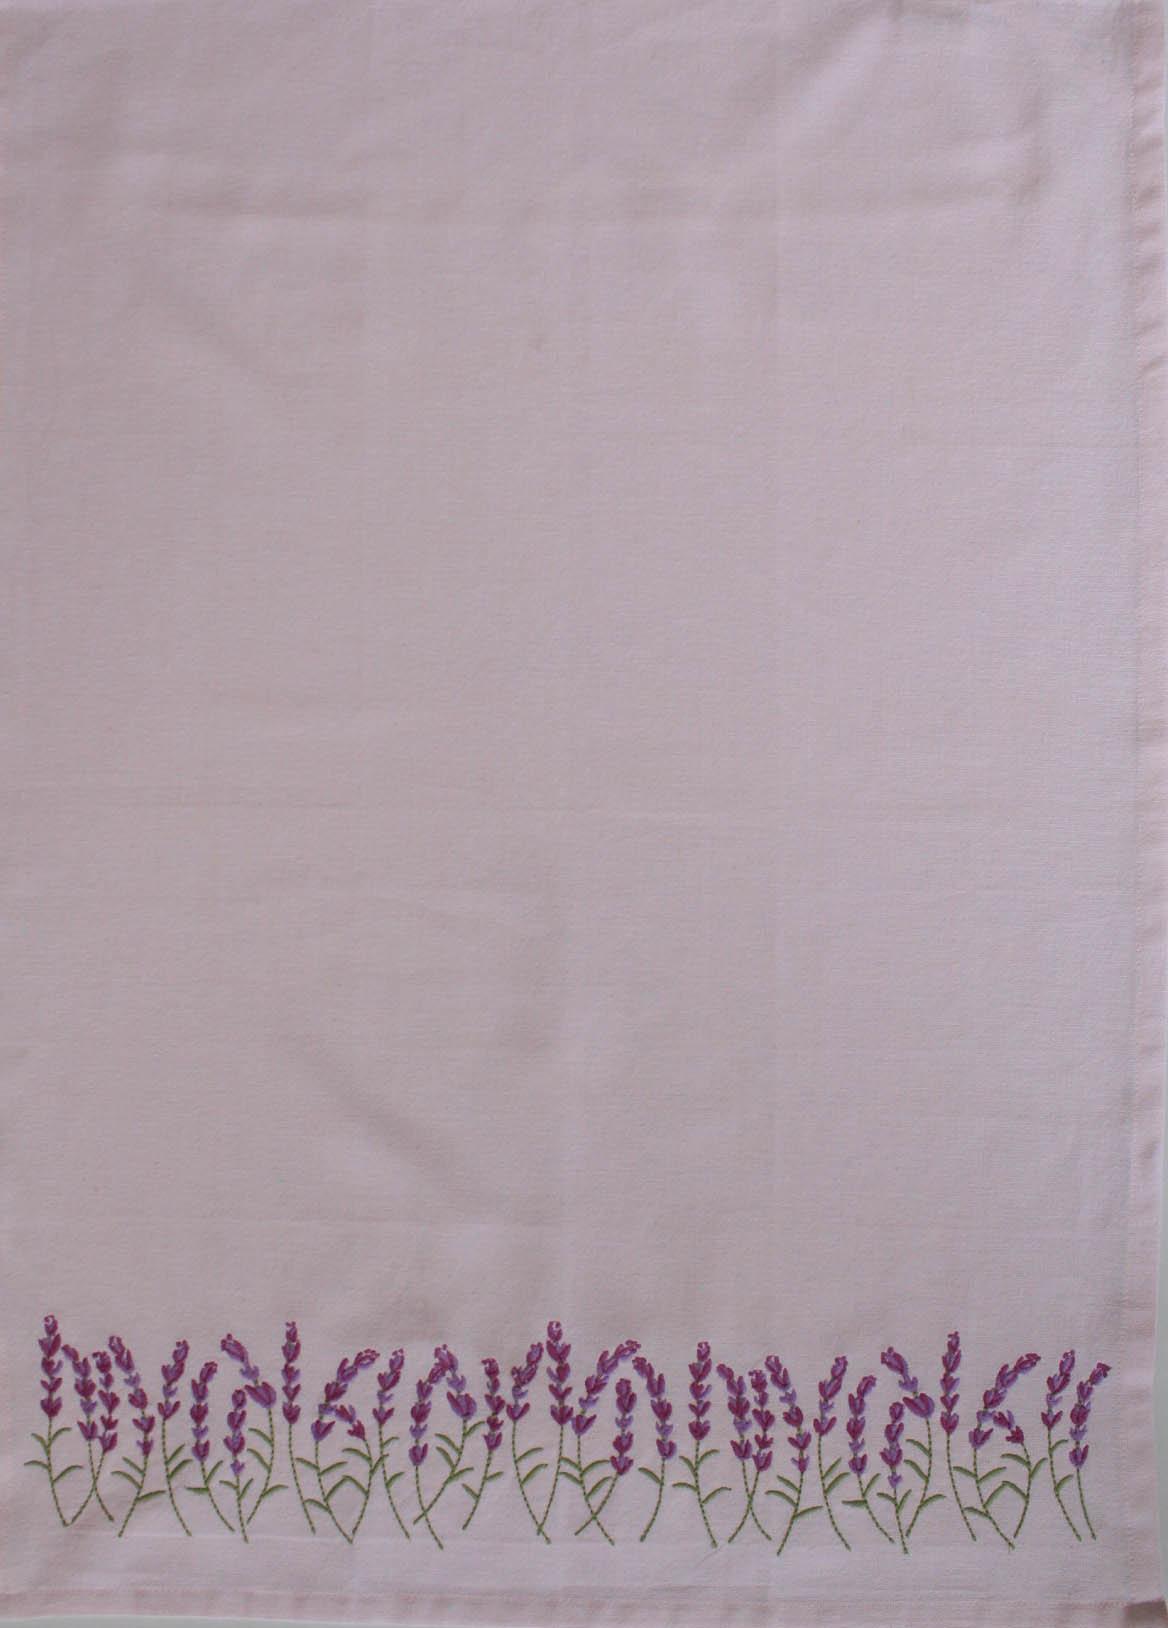 Tea Towel - Lavender Border Embroidery